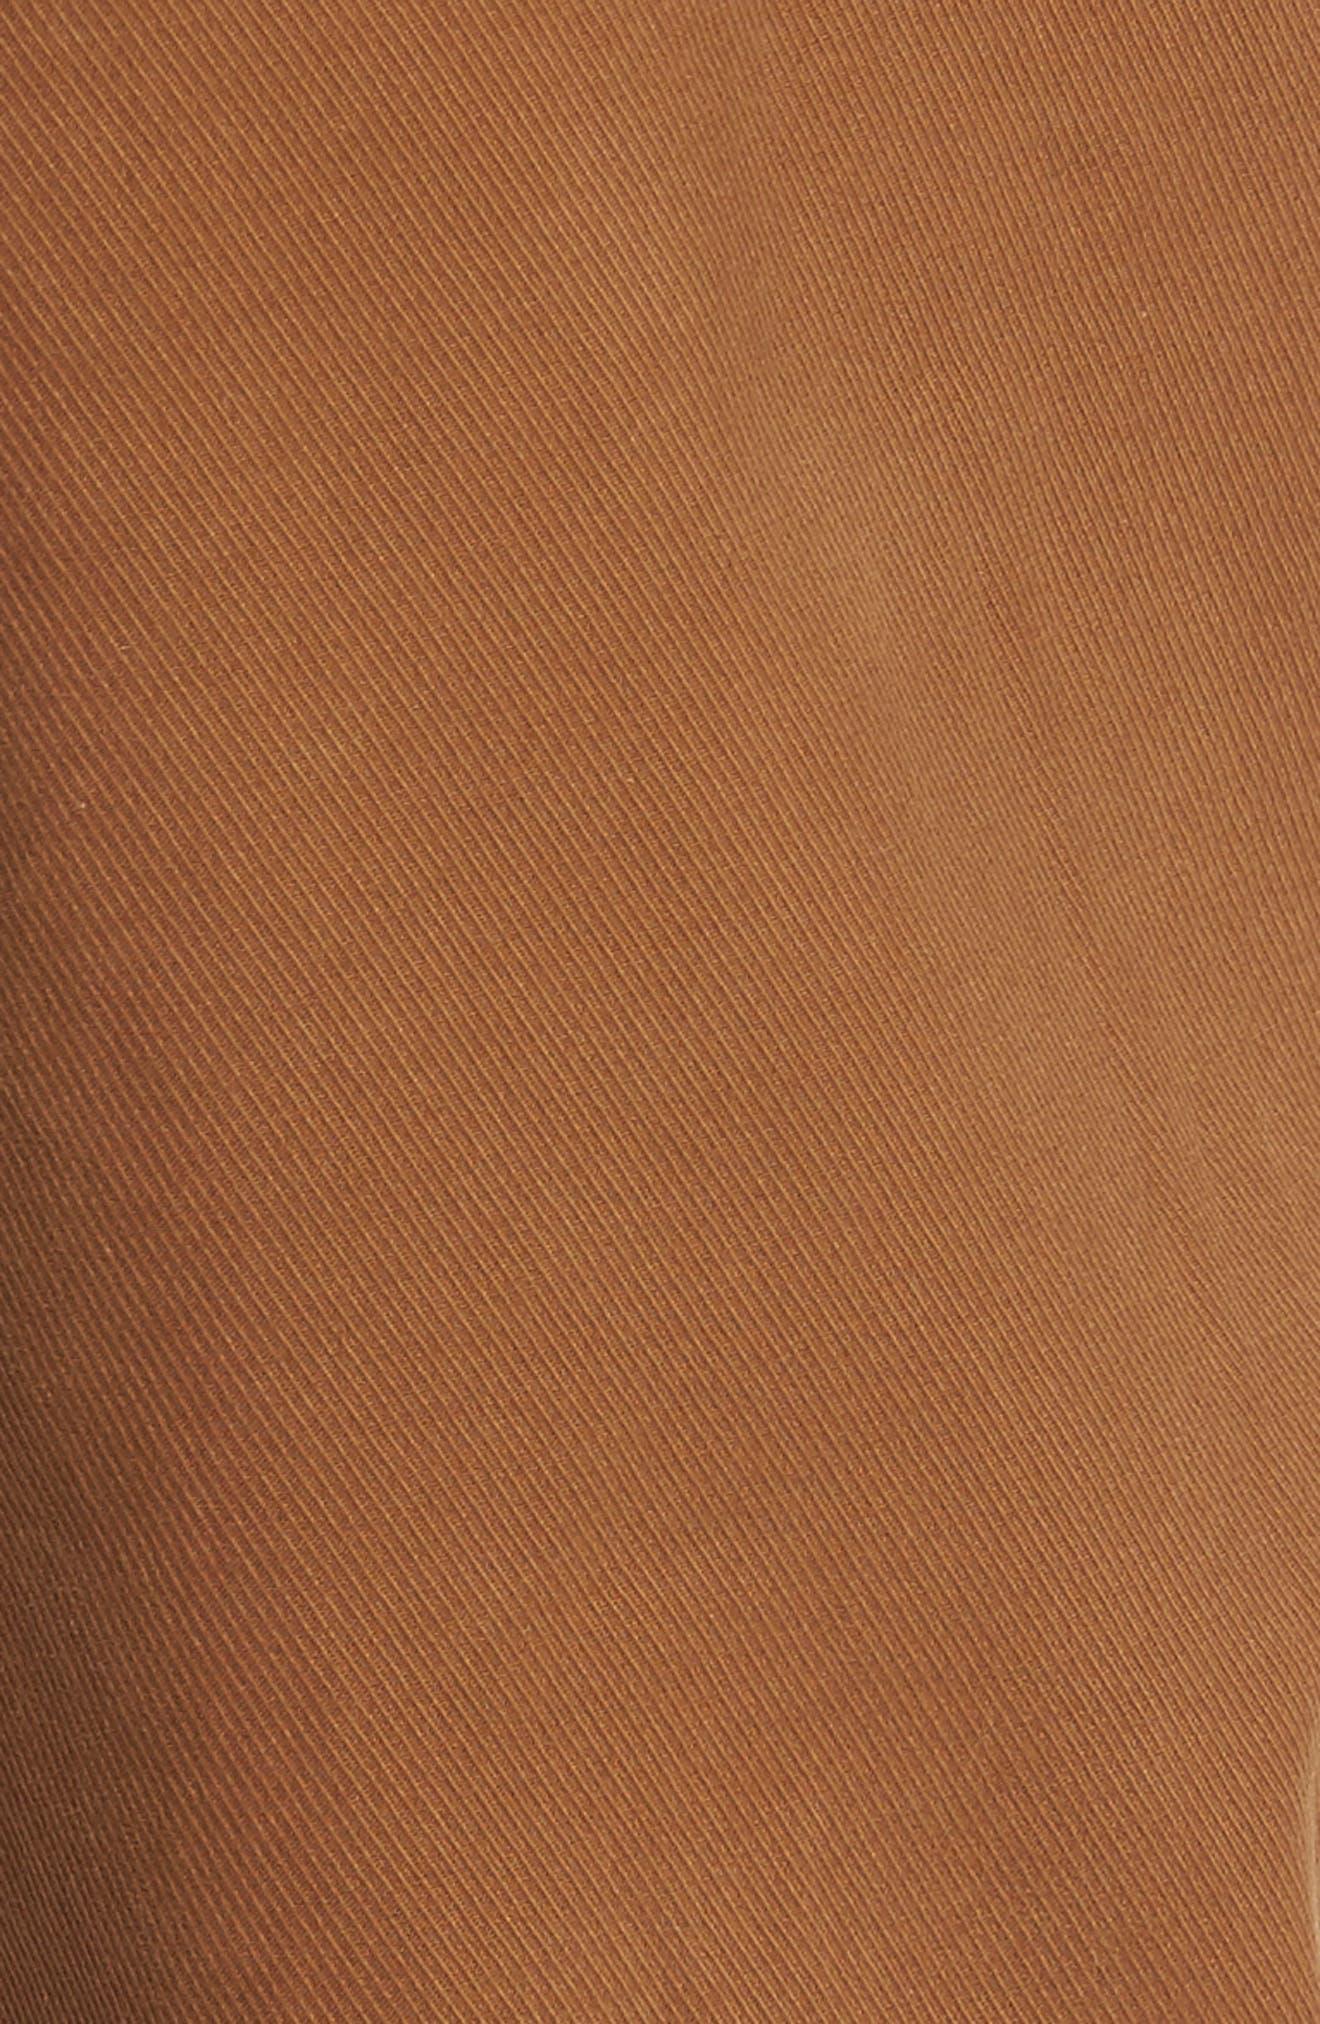 Nick Slim Fit Flat Front Pants,                             Alternate thumbnail 5, color,                             Sienna